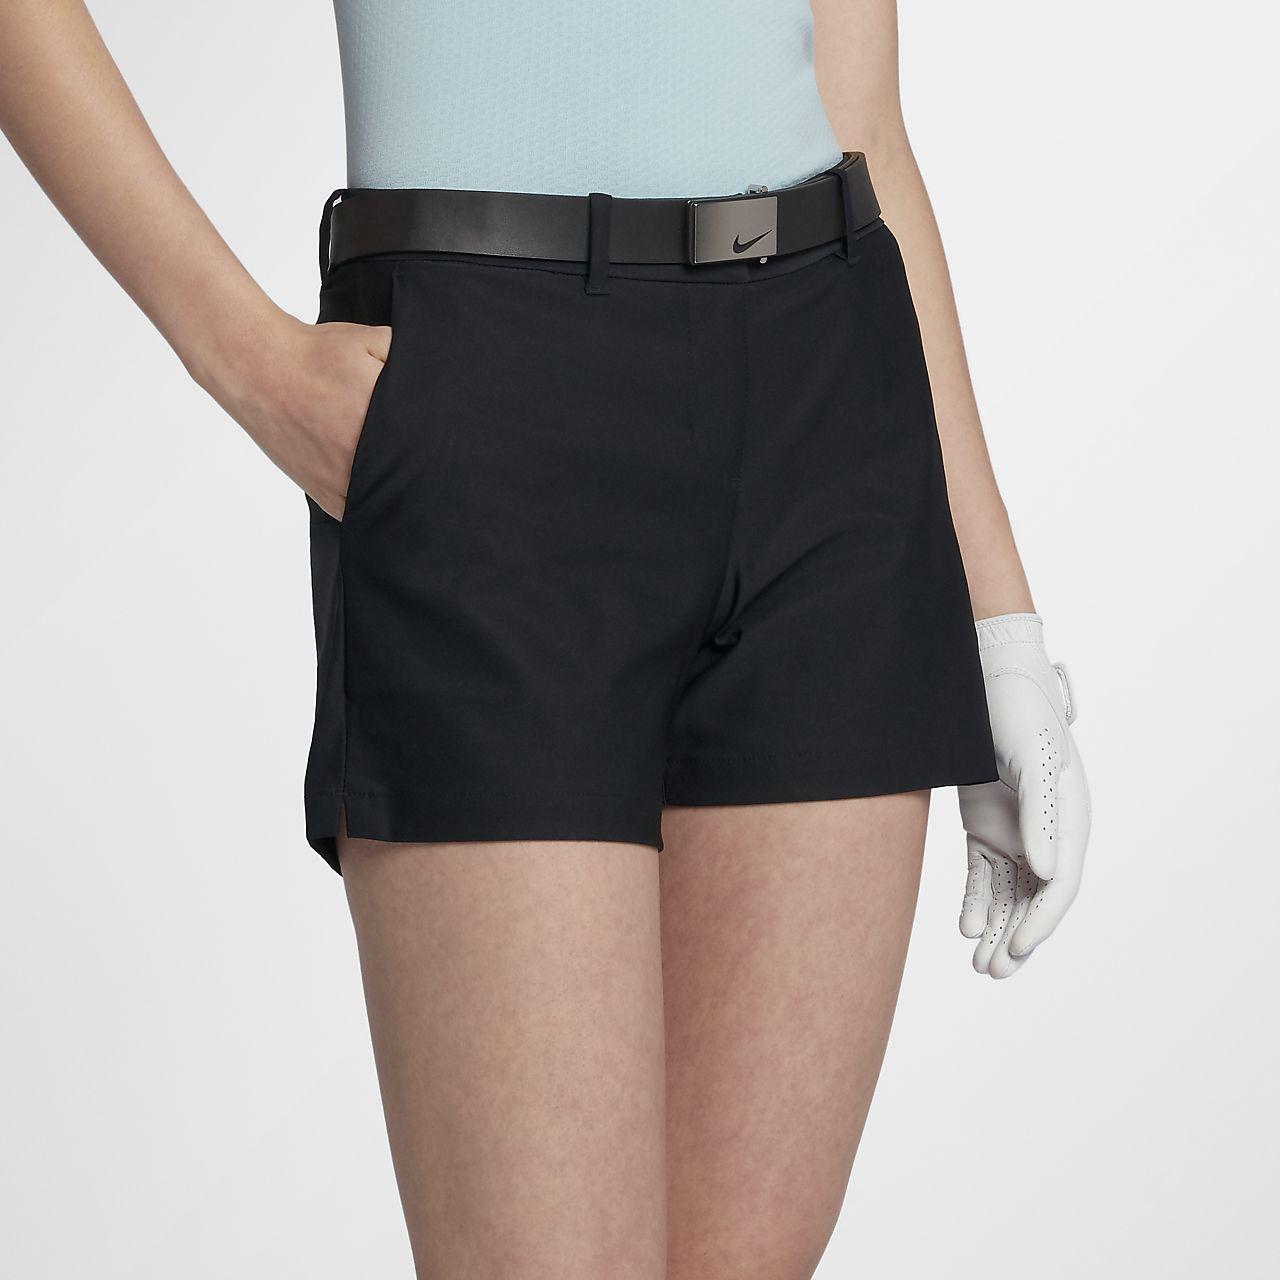 "Nike Flex Women's 4.5"" (10cm approx.) Woven Golf Shorts"